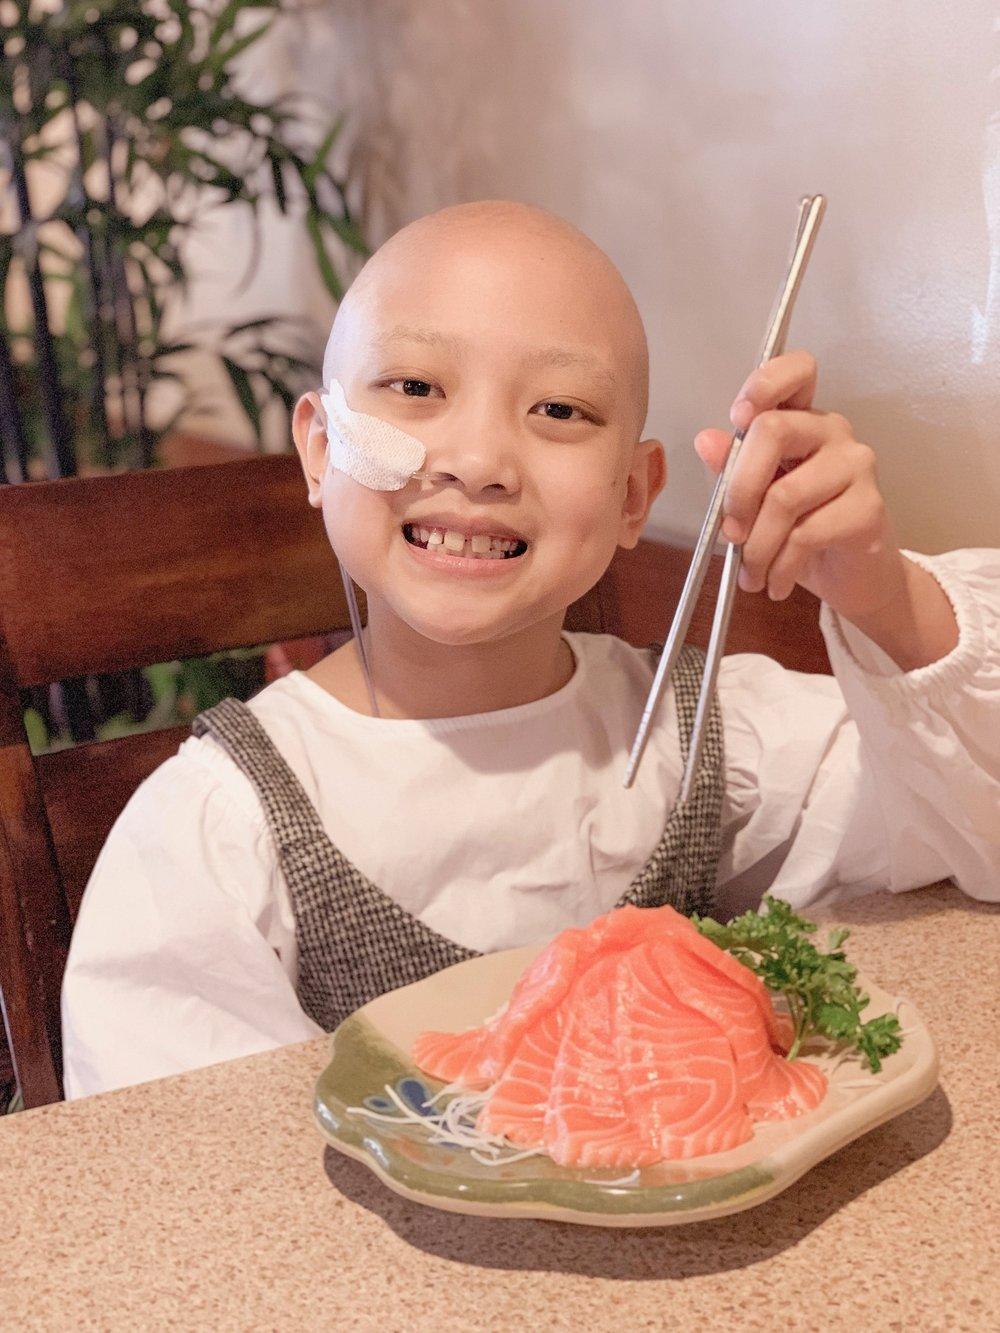 Meet Karmyn - Karmyn Dreams of Sushi!